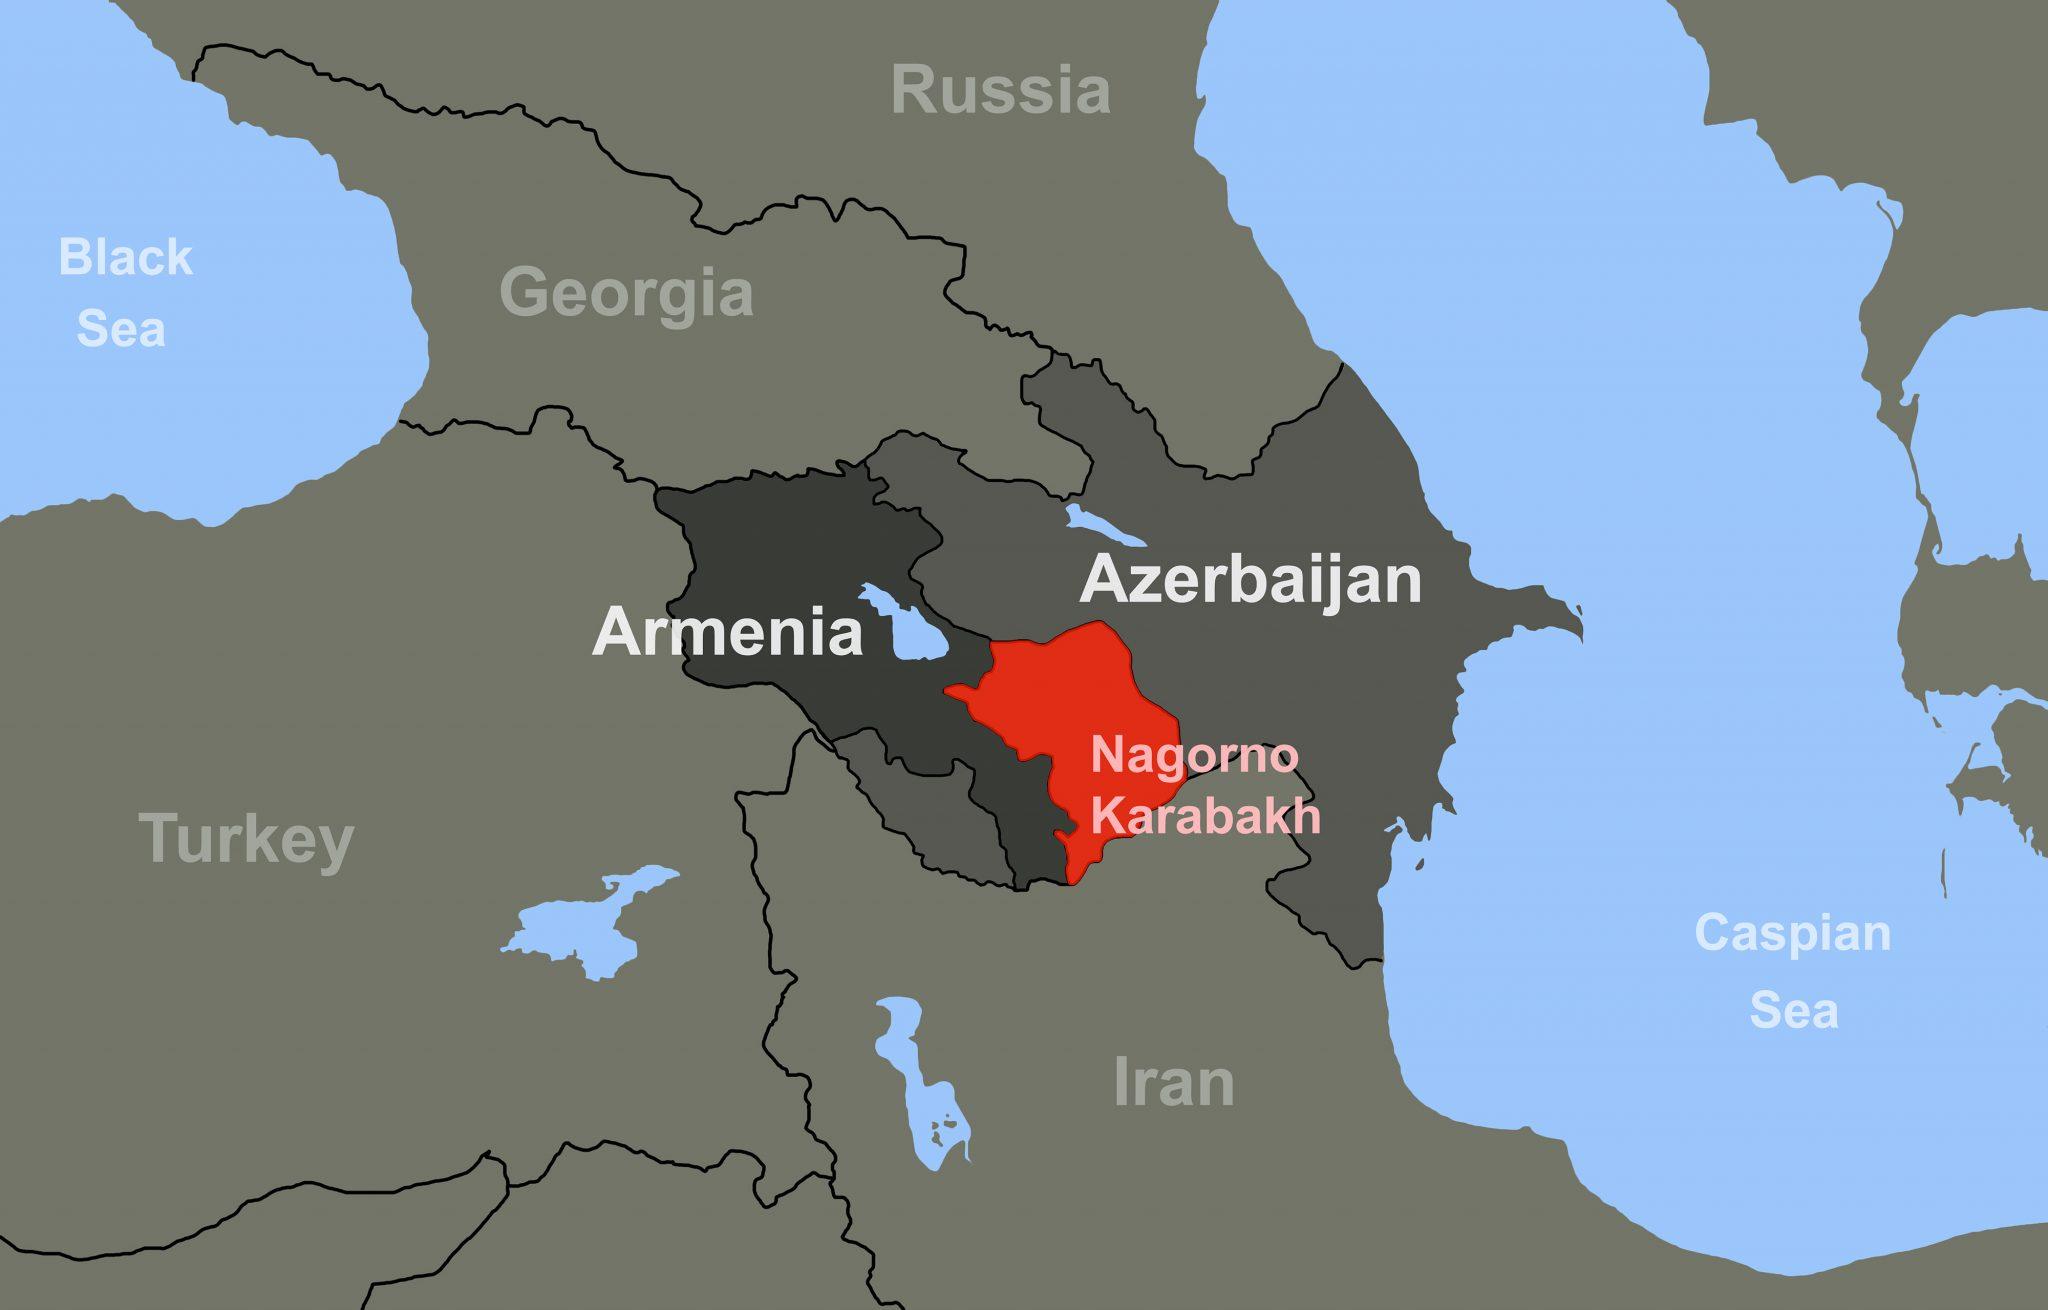 Armenia Azerbaijan Conflict In Nagorno Karabakh On Outline Map